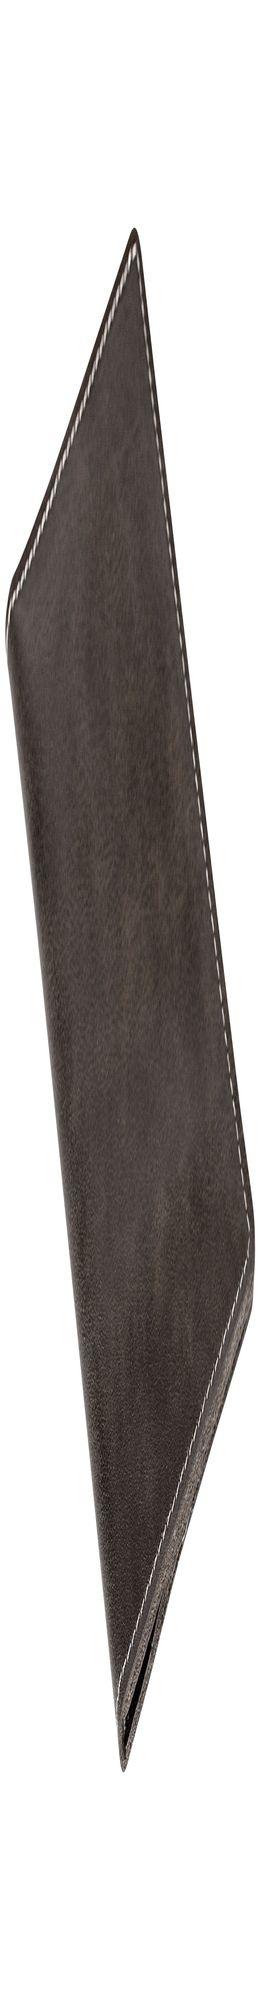 Бумажник водителя Apache, темно-серый фото